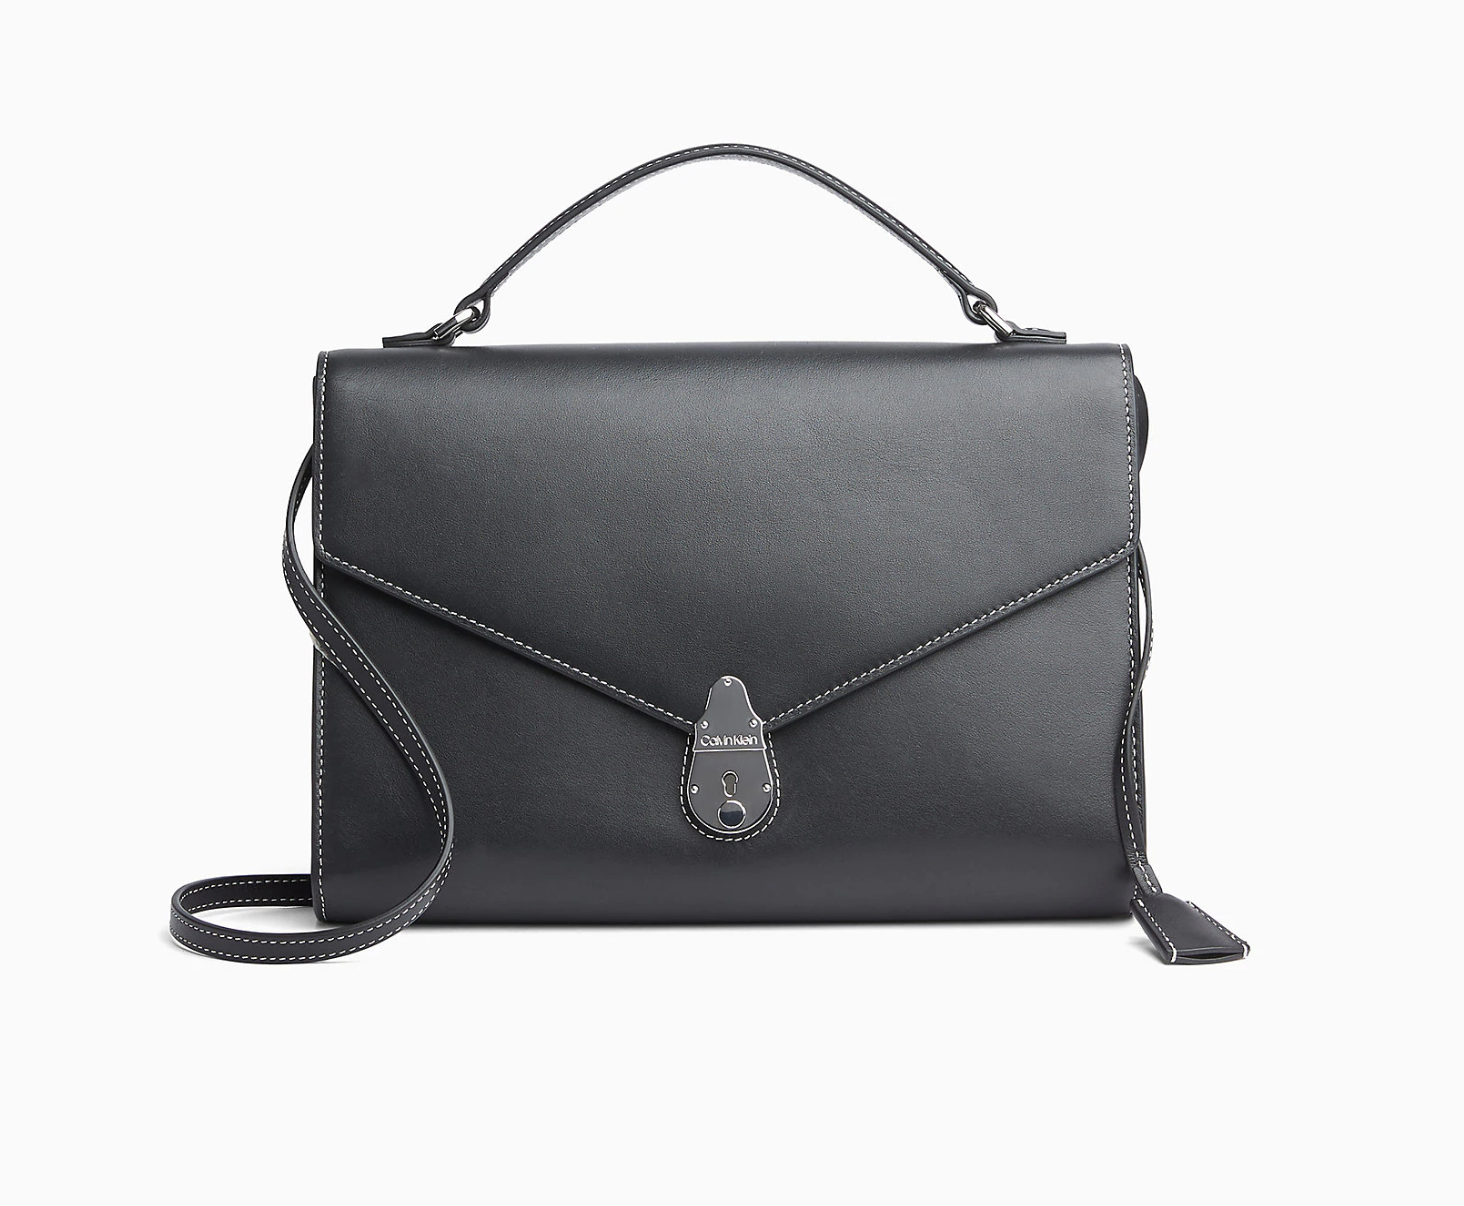 Leather Lock Crossbody Bag